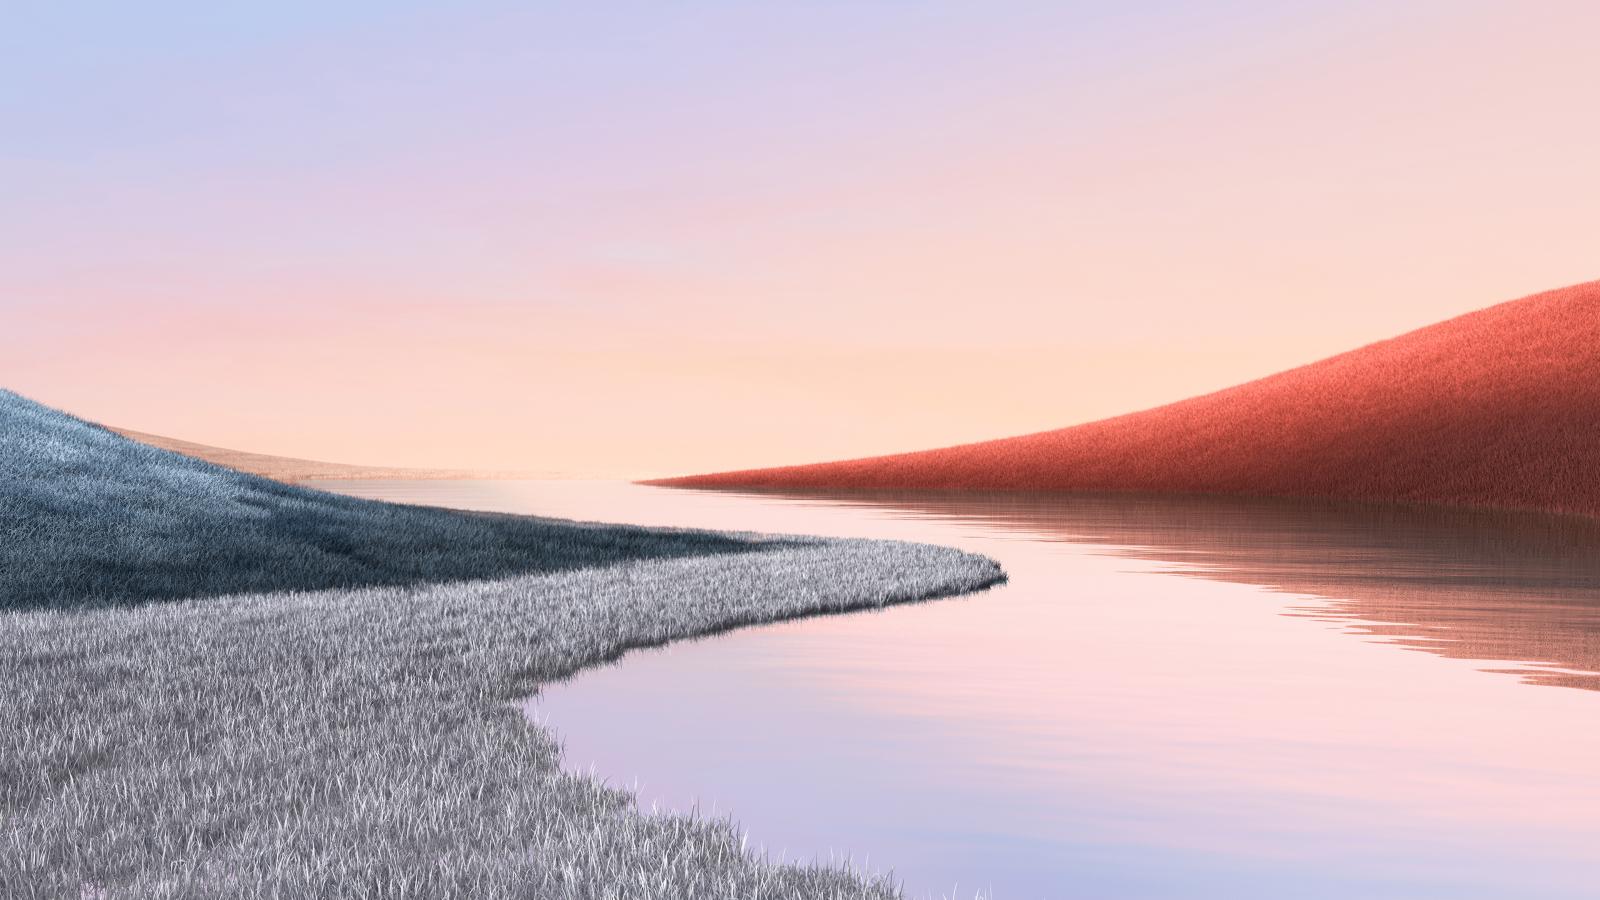 1600x900 4K Colorful Landscape 1600x900 Resolution ...